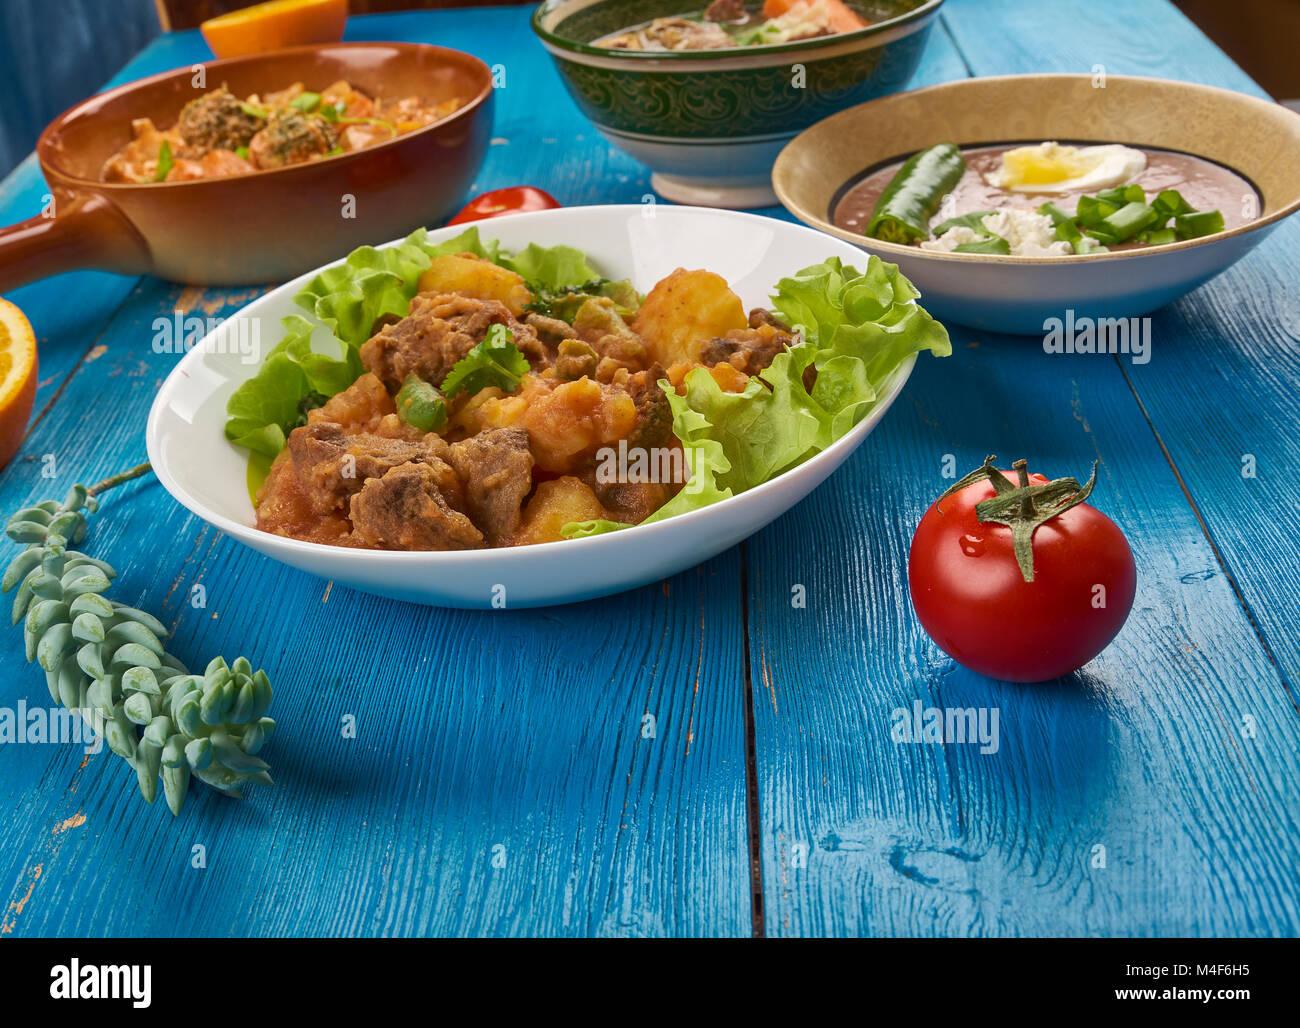 Sugo Stock Photos & Sugo Stock Images - Alamy